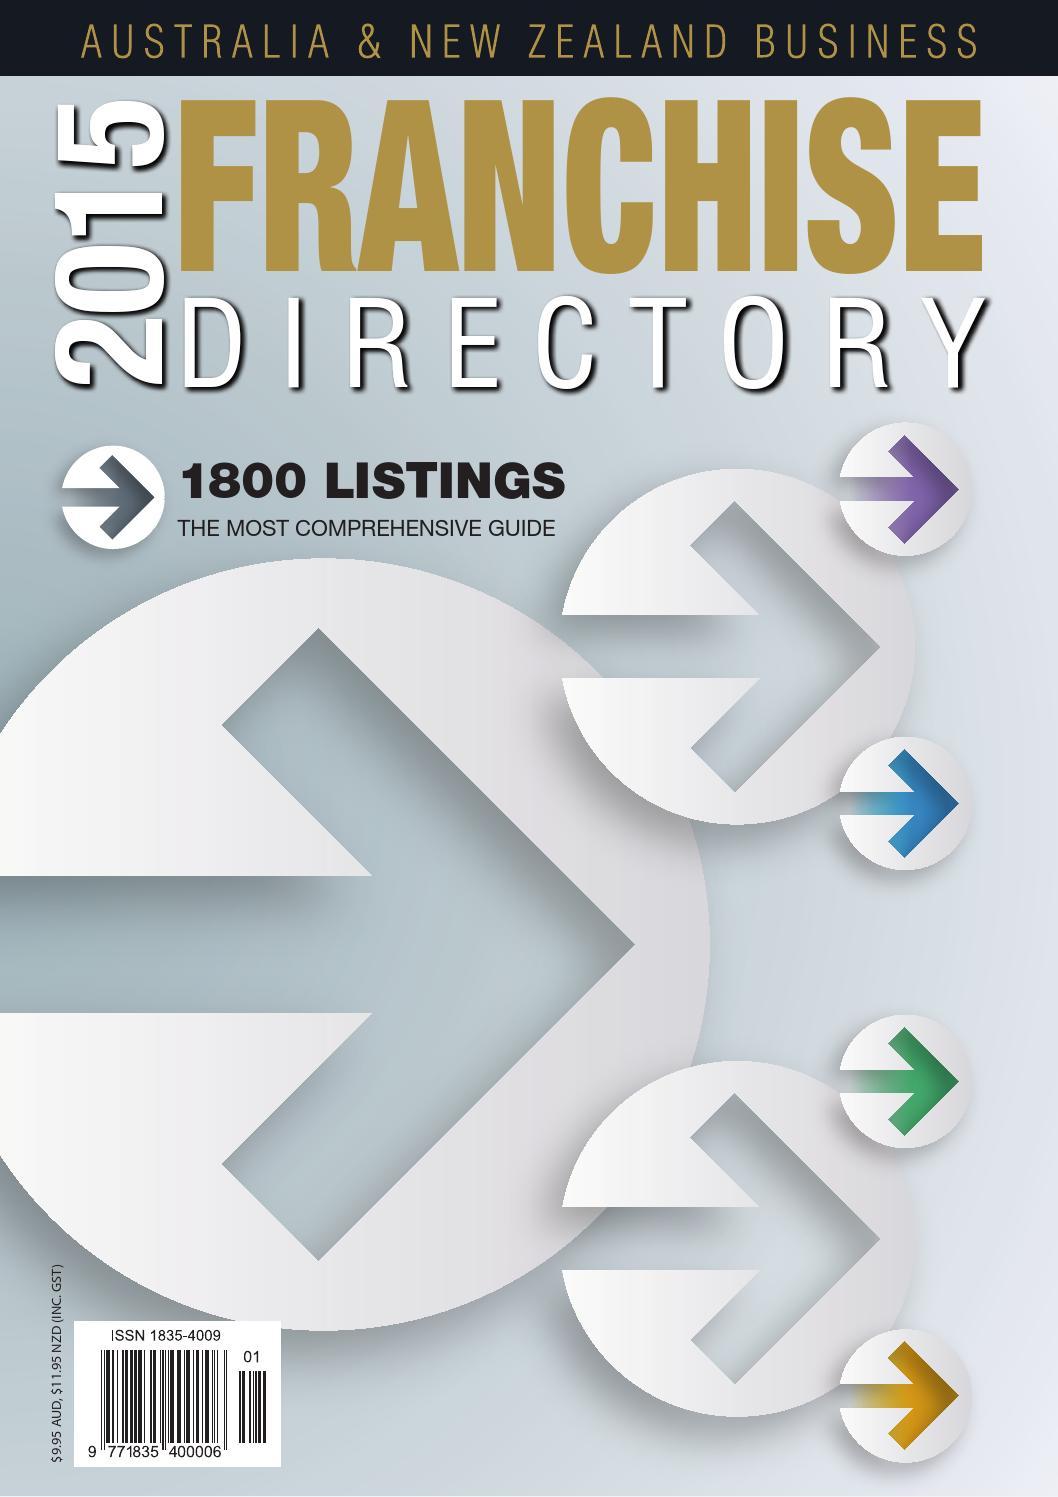 2015 Aus   NZ Business Franchise Directory by CGB Publishing - issuu af367927c5651